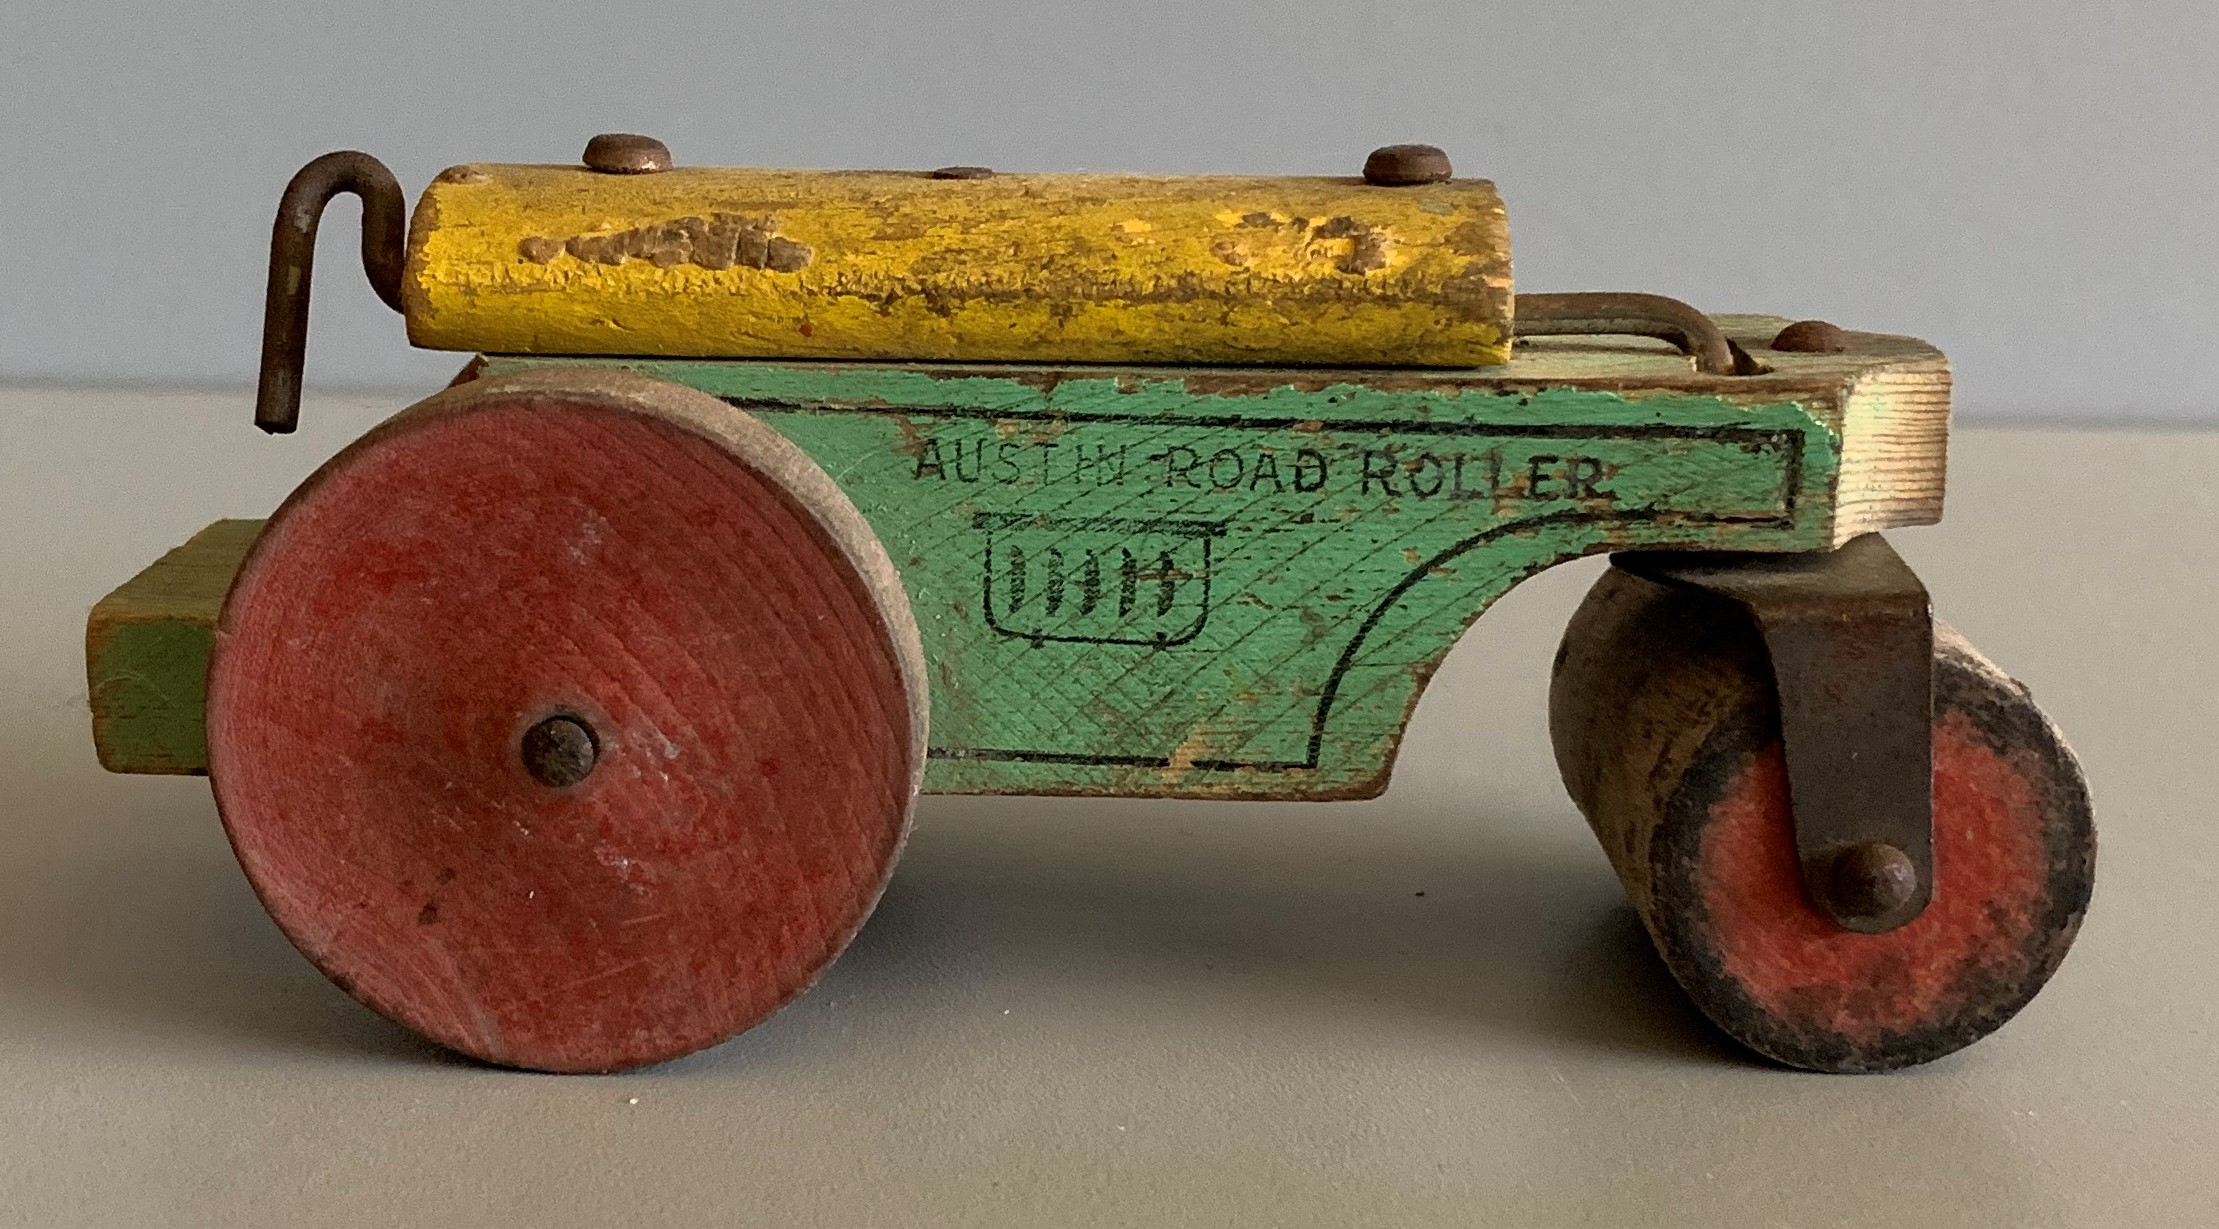 Strombecker Austin Road Roller